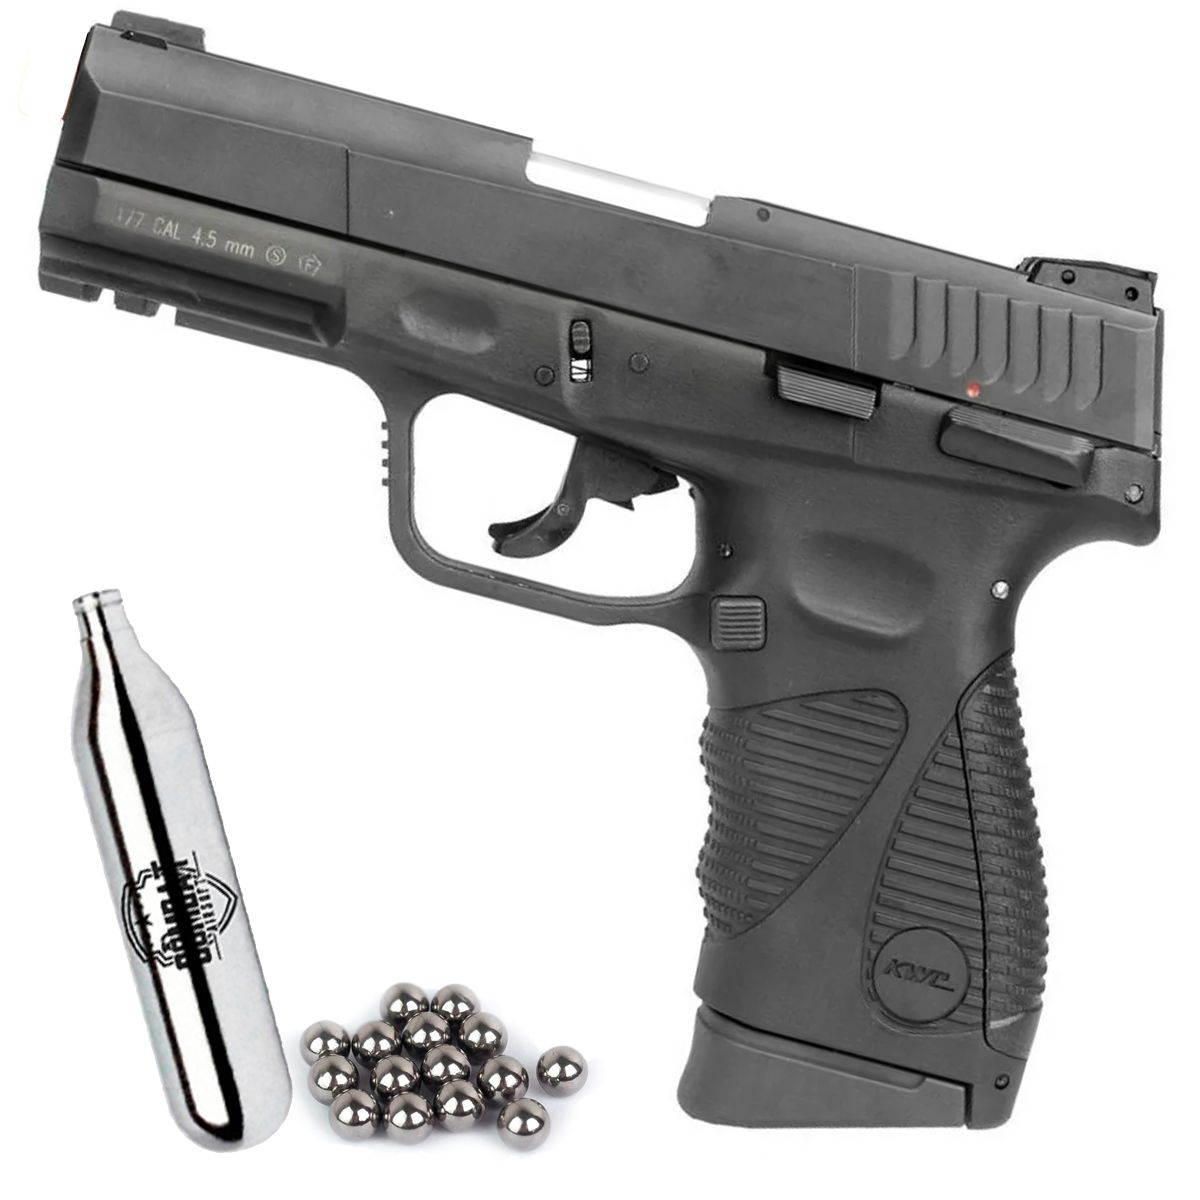 Pistola Kwc Airgun CO2 24/7 G2 Blowback Preta Metal 4,5mm